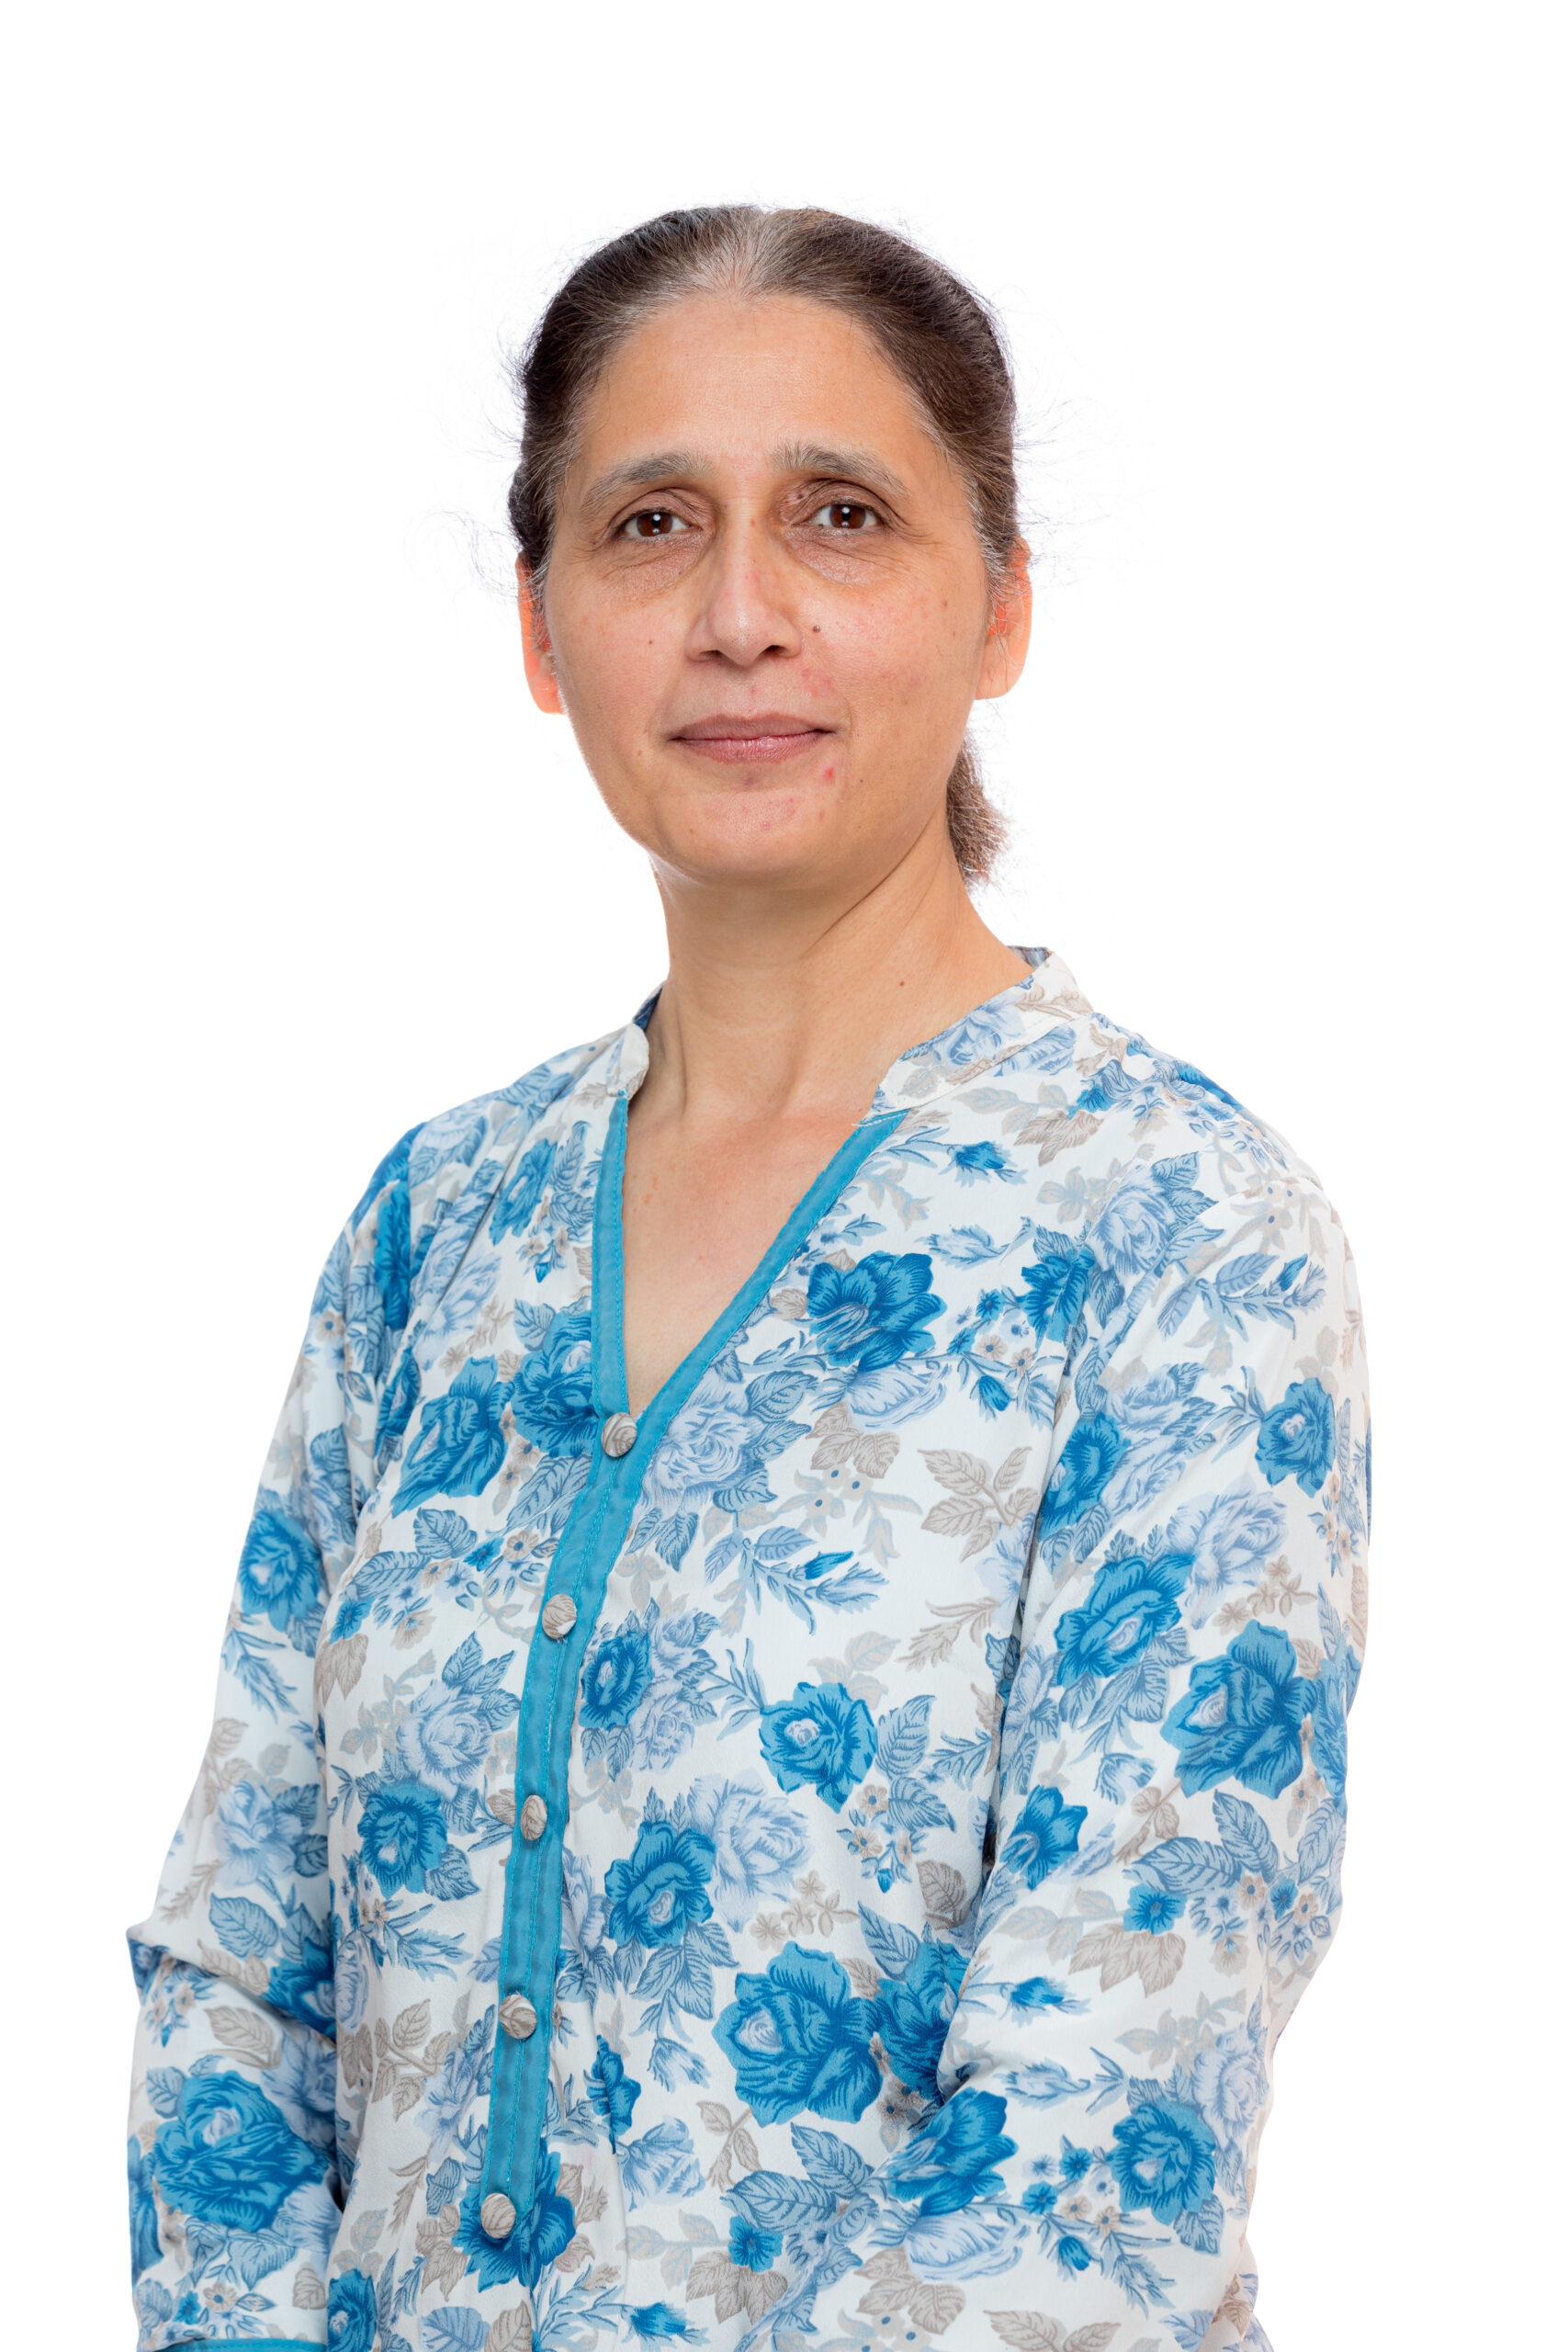 Mrs Bhardwaj